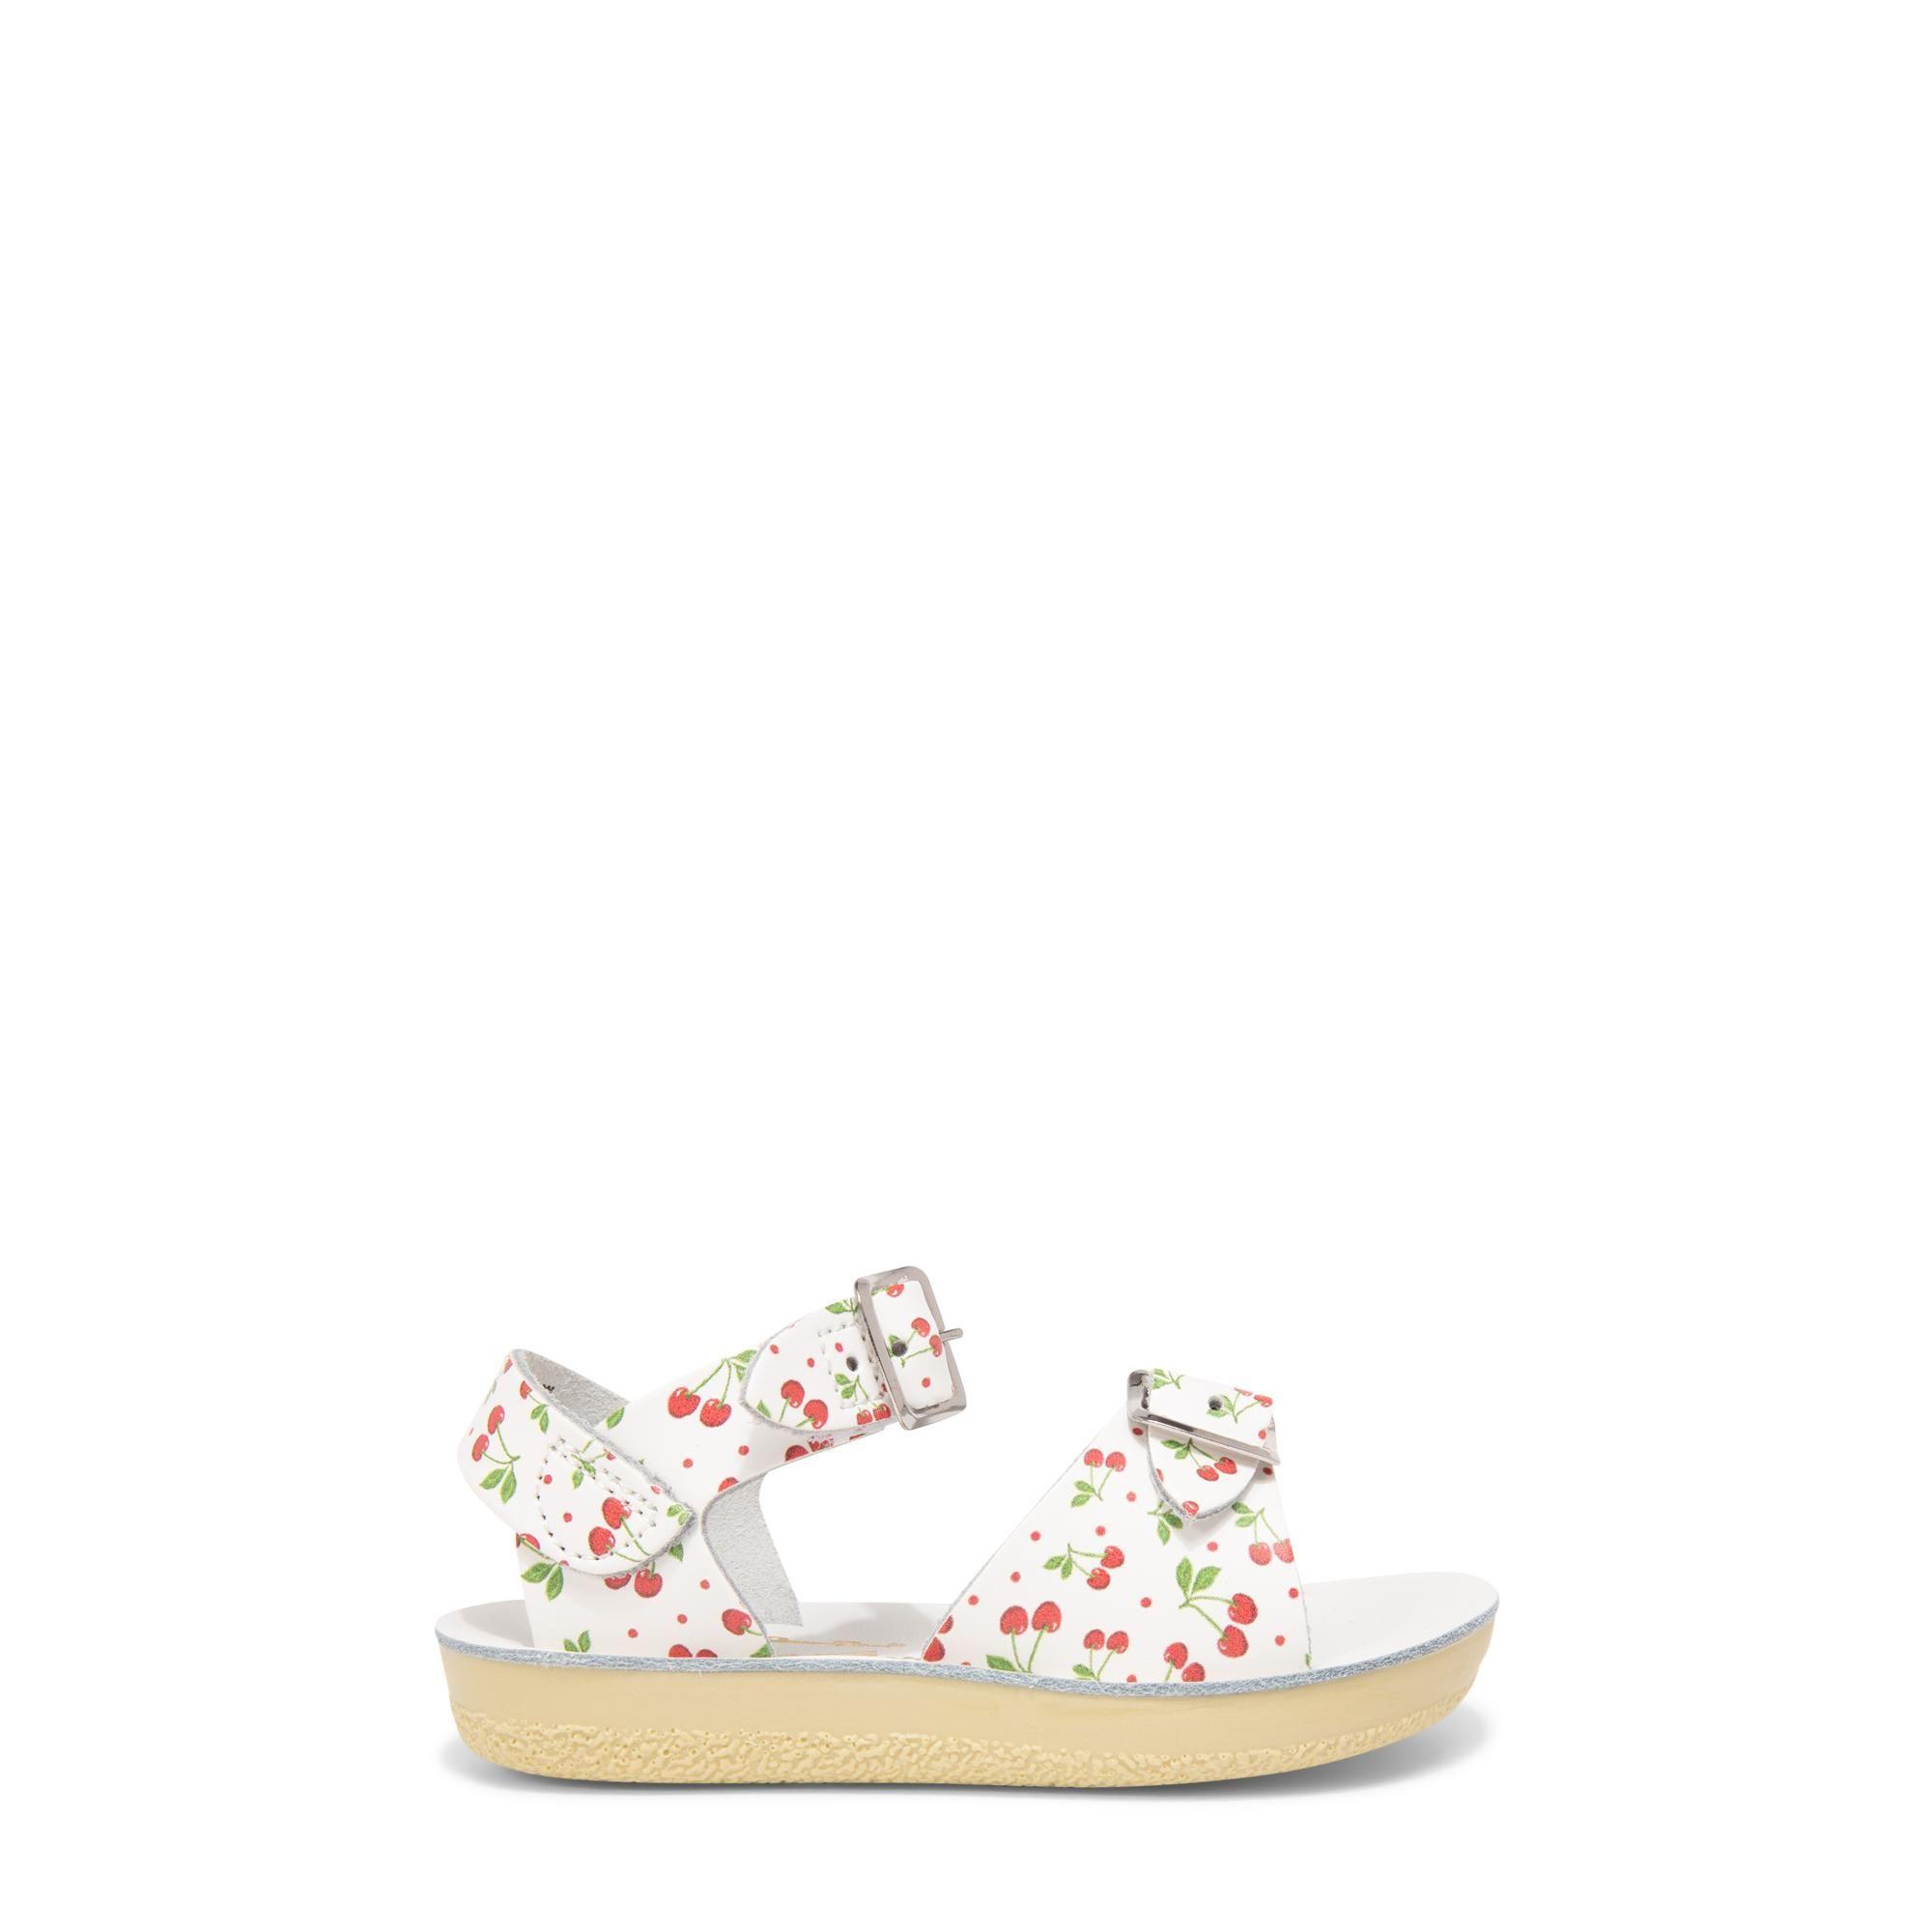 Surfer sandals